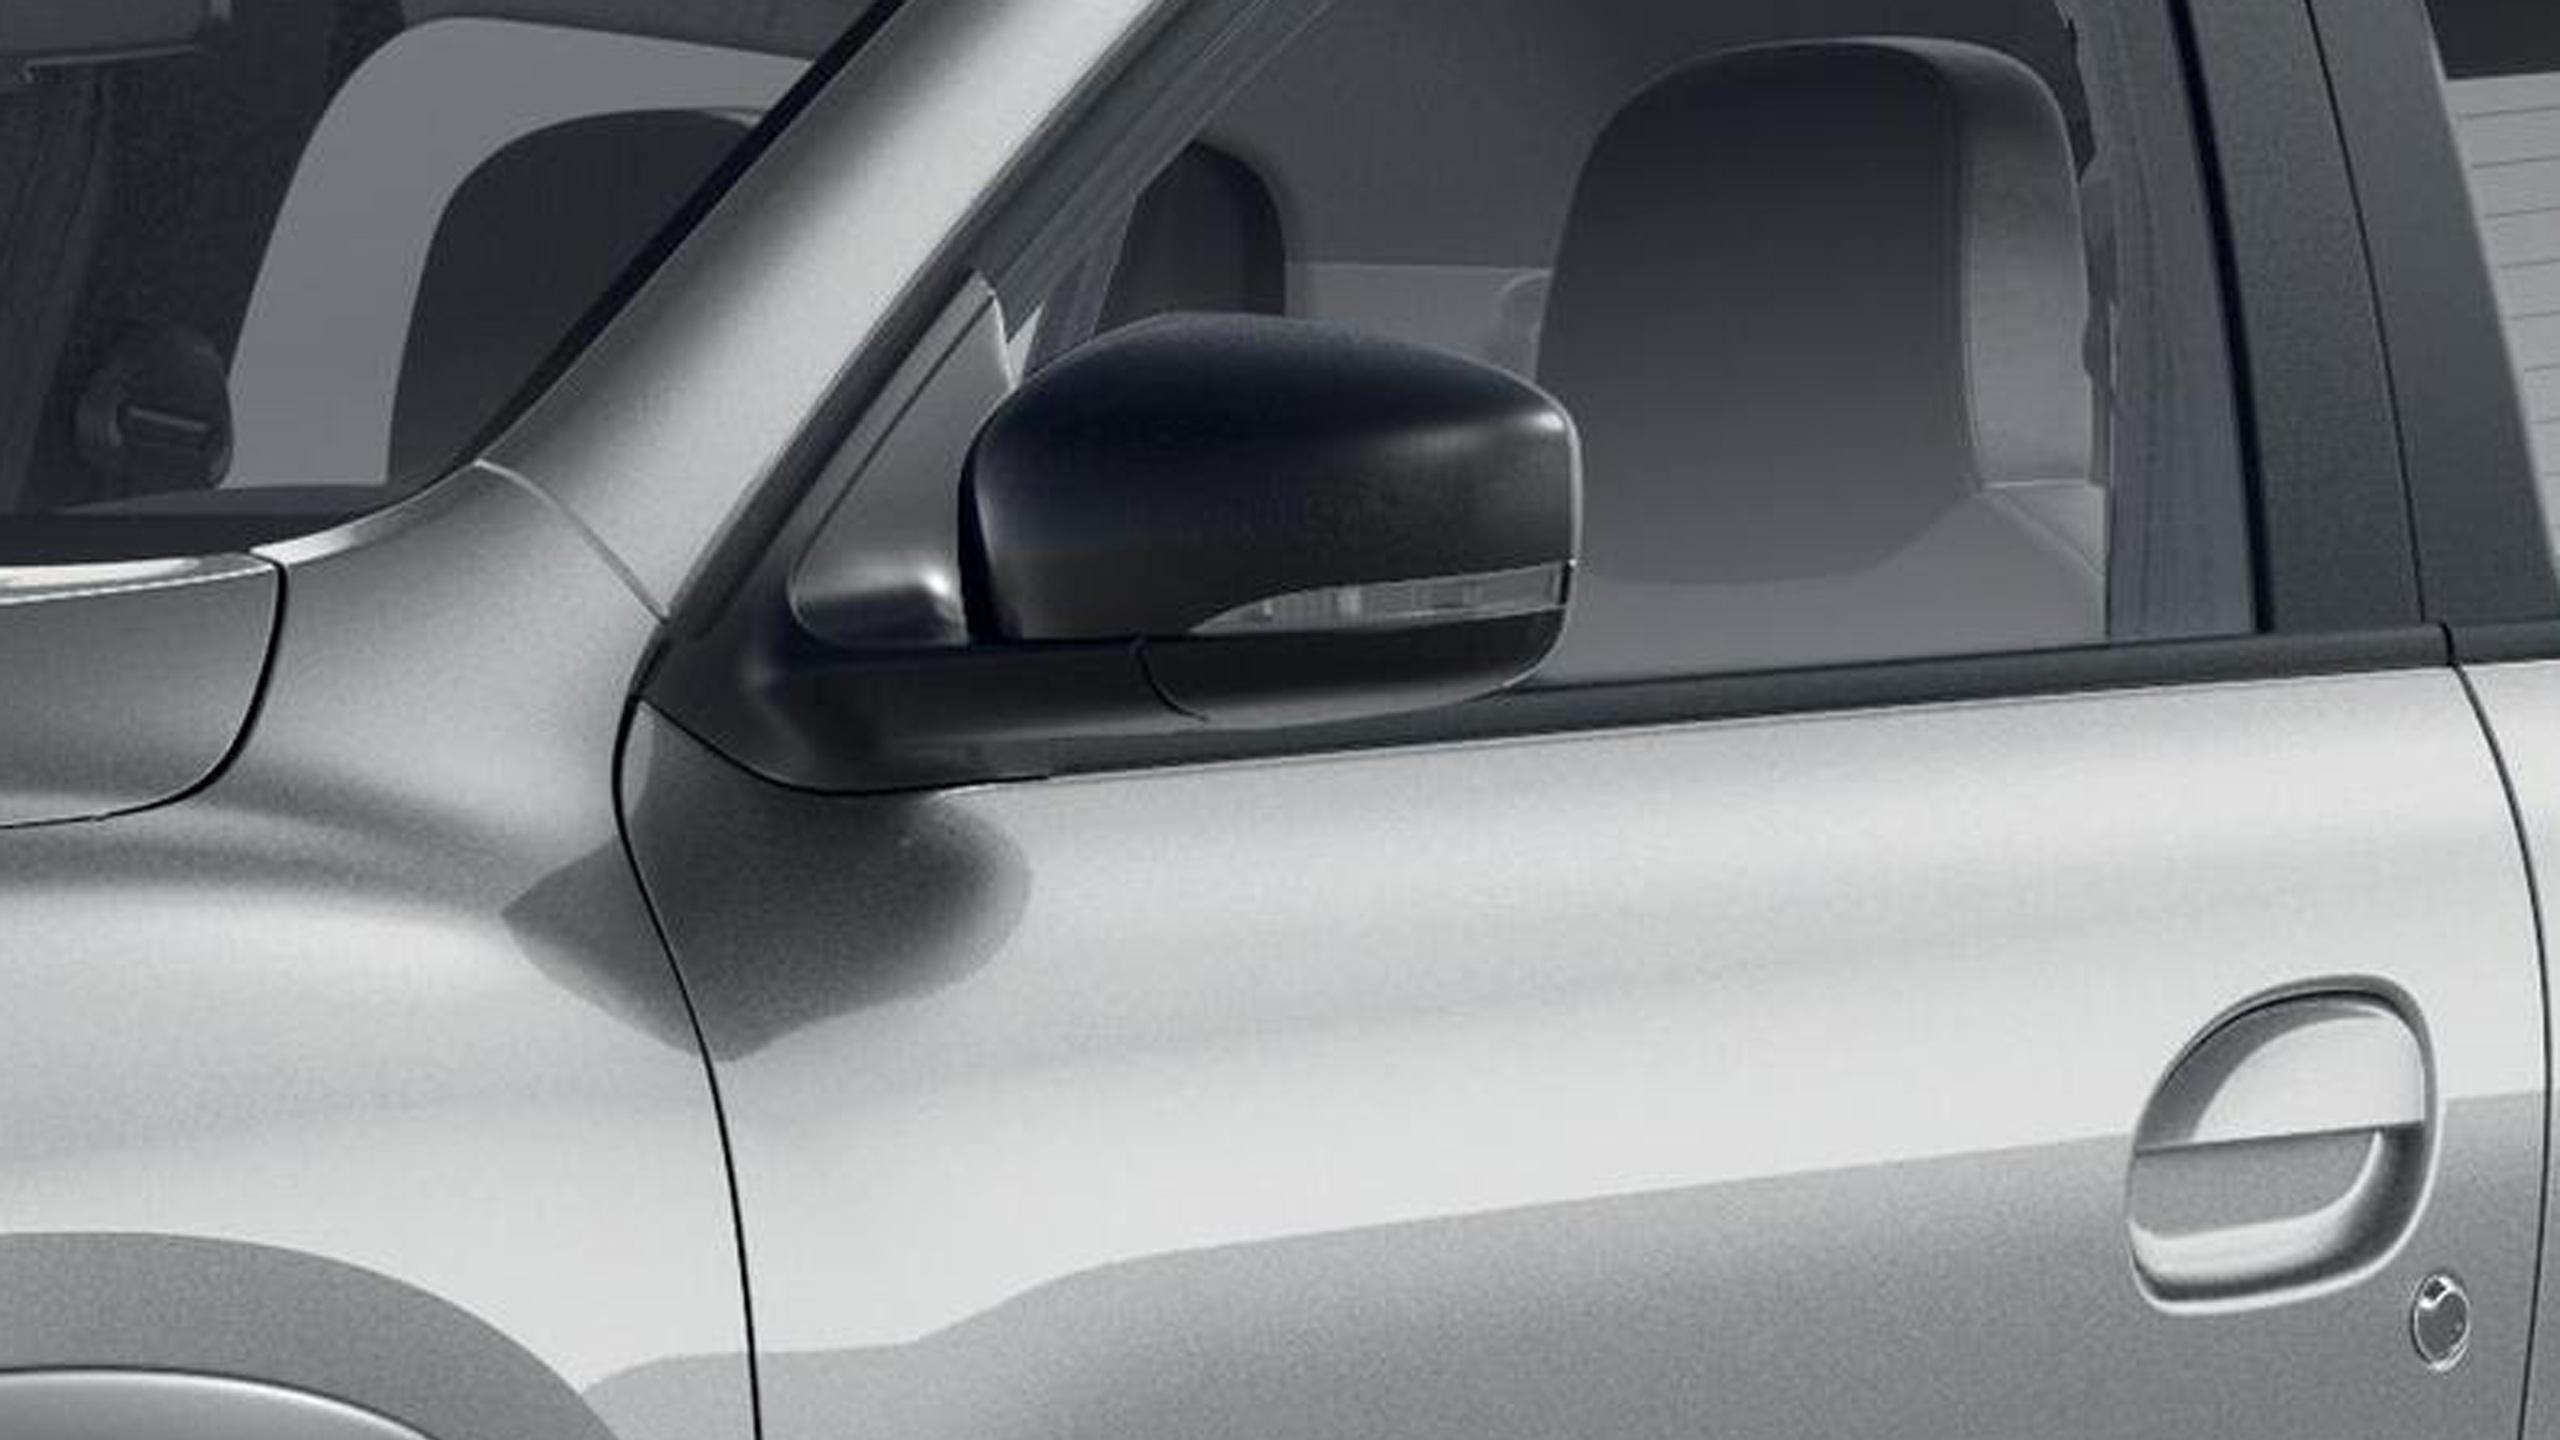 Oglinzi retrovizoare reglabile electric